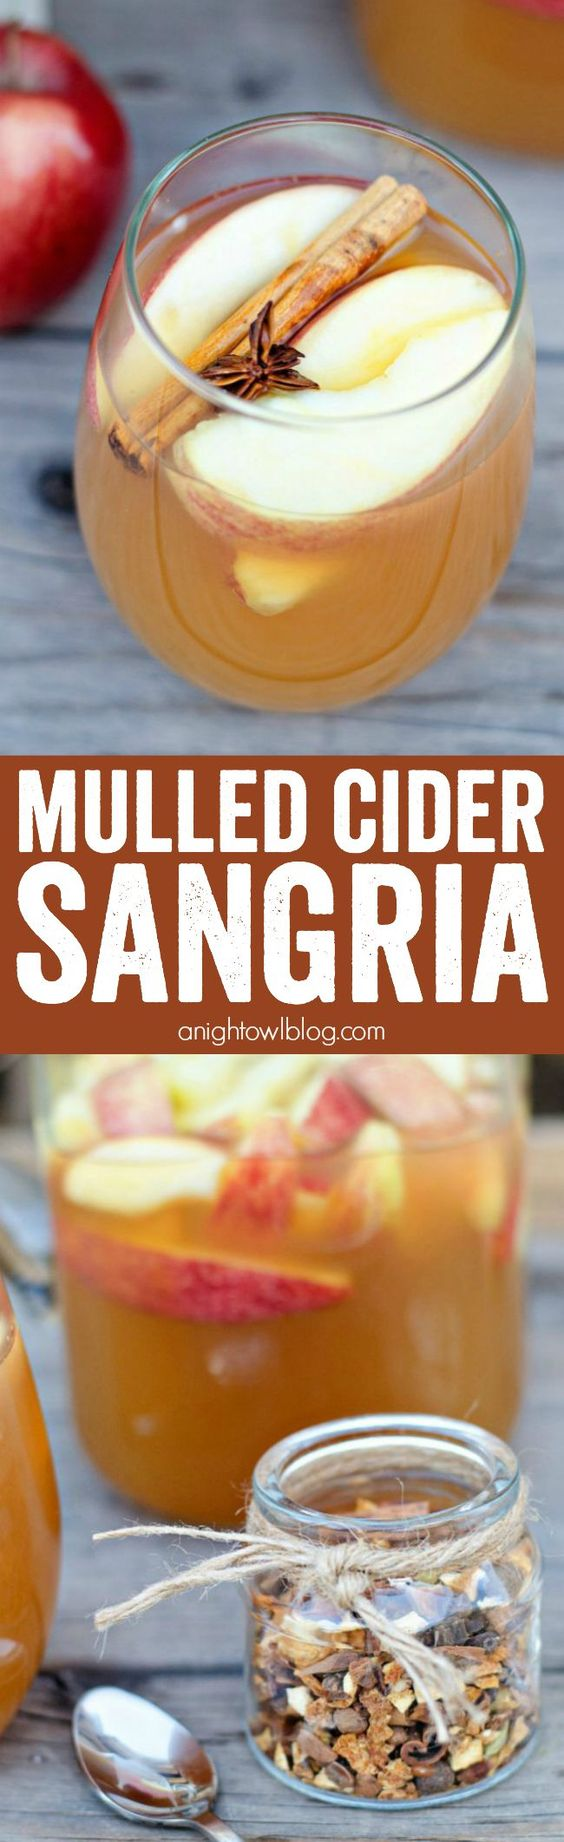 Mulled Apple Cider Sangria | Recipe | Muslin bags, Apple ...